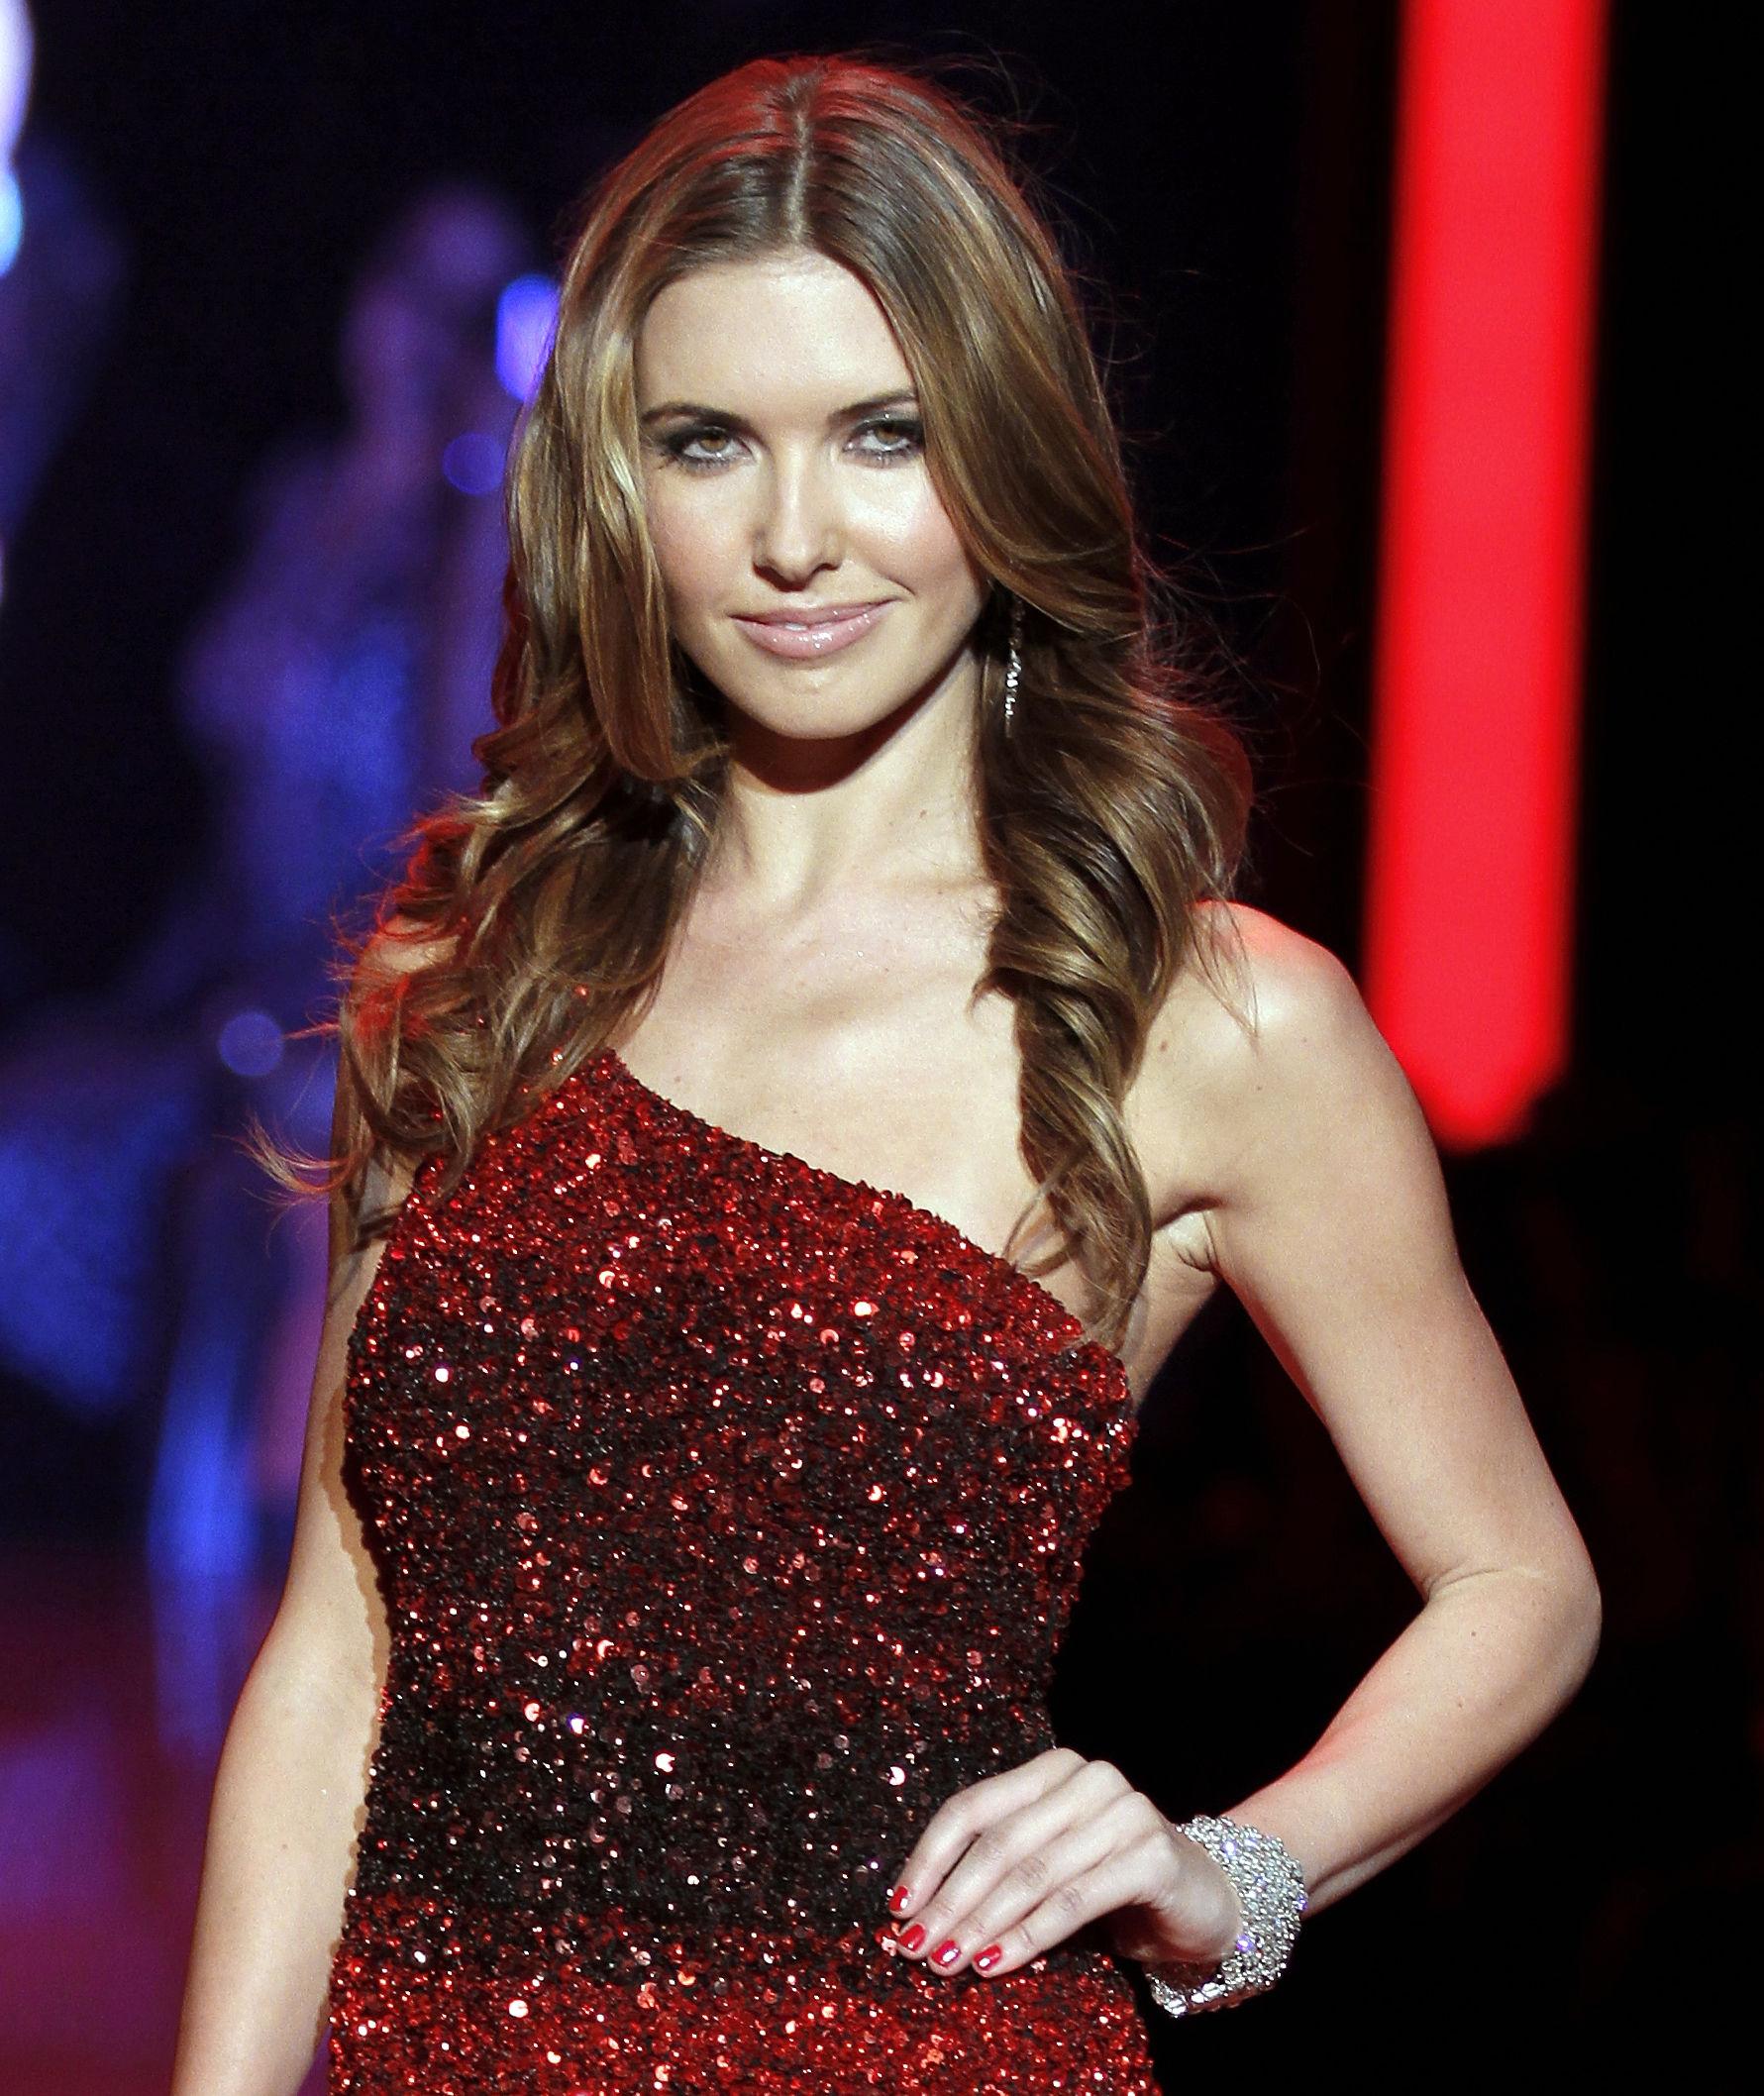 Photo of Audrina Patridge: American reality television star